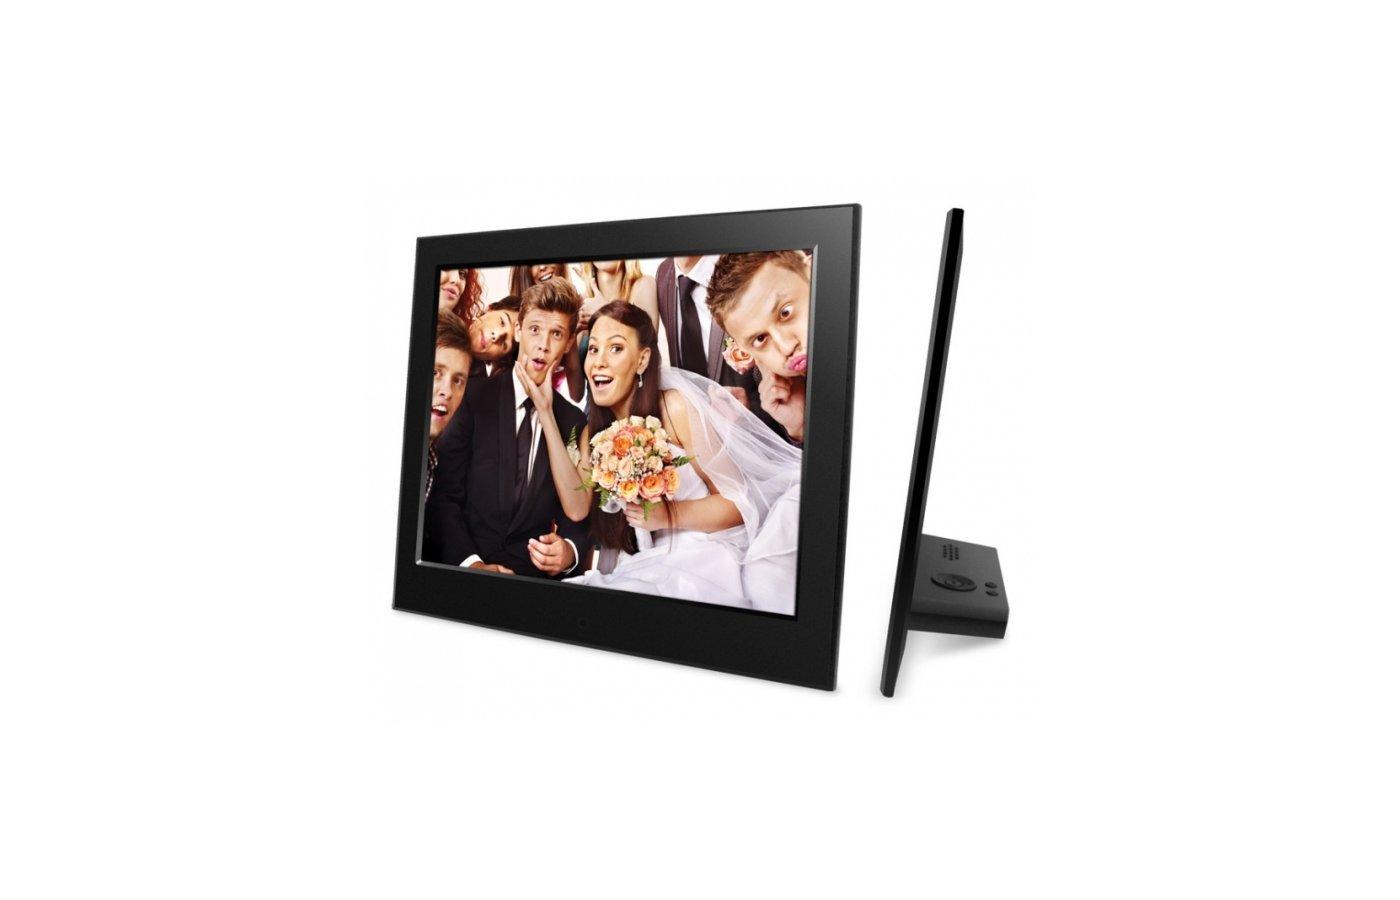 Цифровая фоторамка Digma 8 PF-840 800x600 черный пластик ПДУ Видео